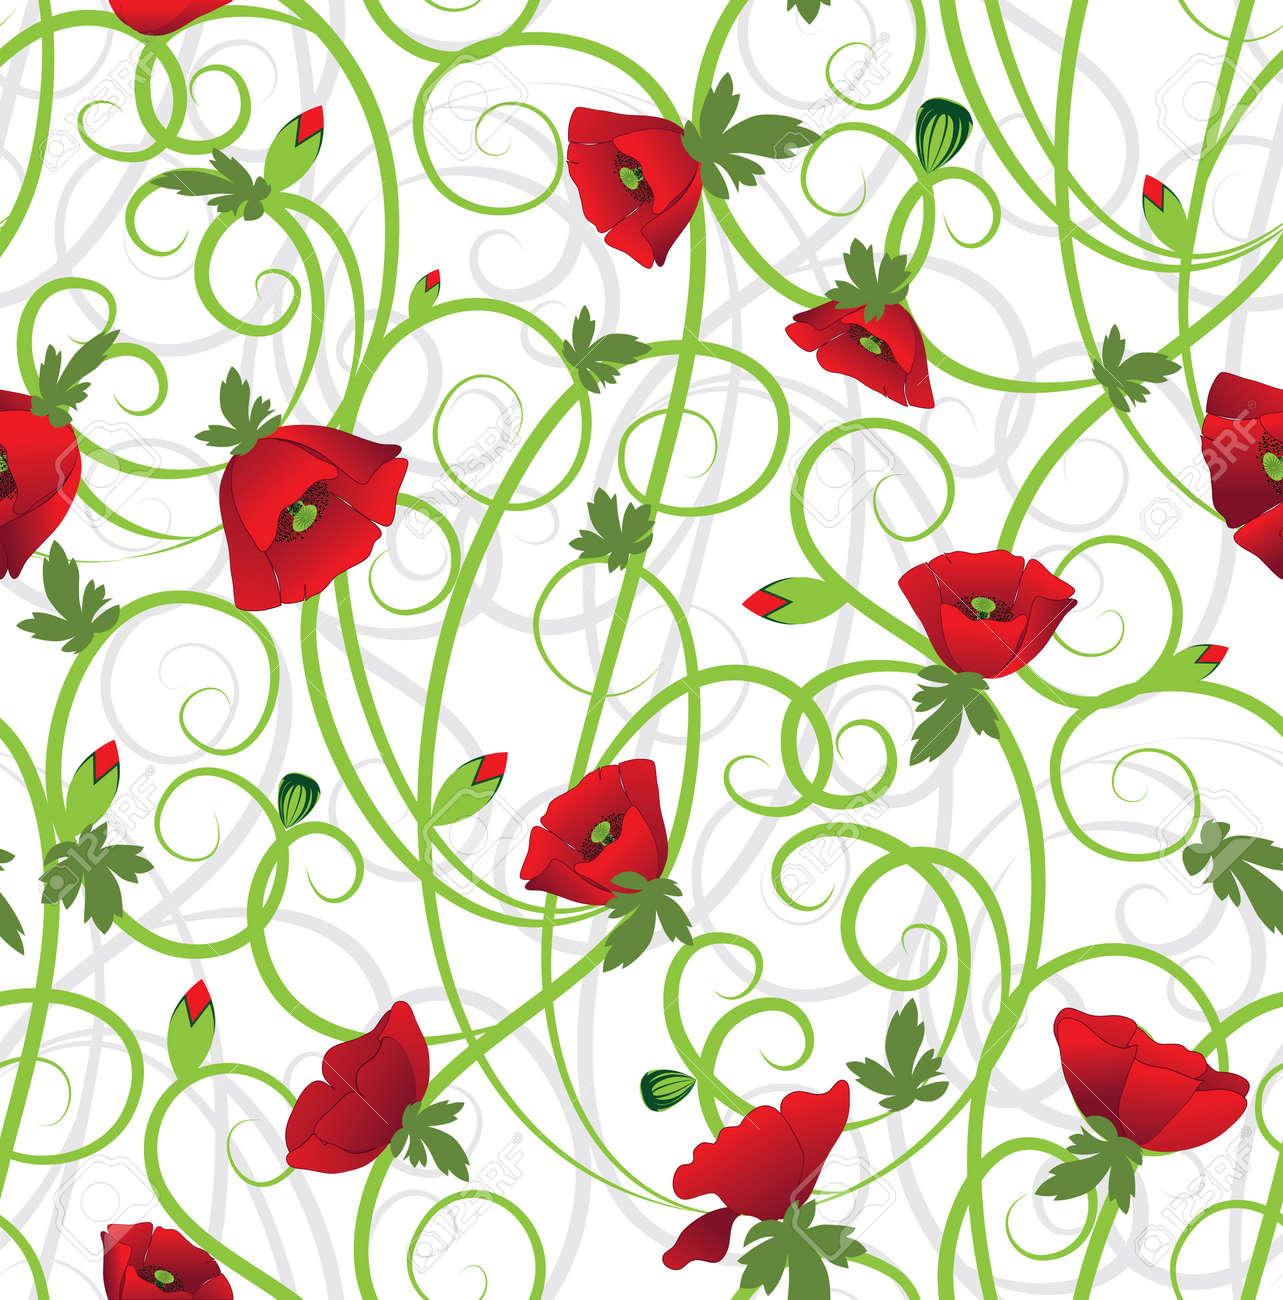 Poppy seamless background. Flower filigree Art border pattern. Floral vintage design. Pretty cute wallpaper. Feminine filigree Stock Vector - 14286605